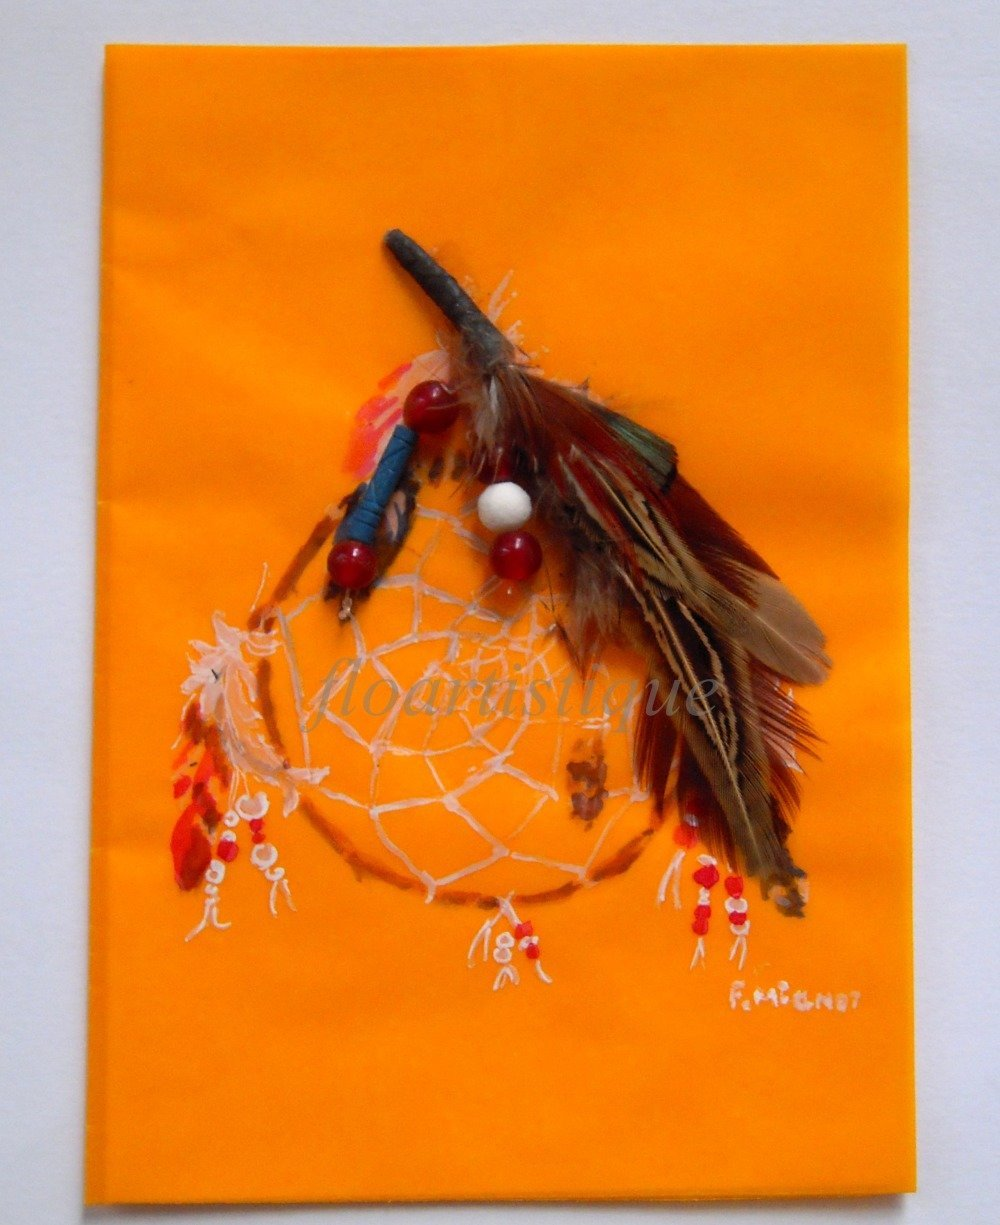 Carte aquarelle, attrape-rêve, plumes et perles